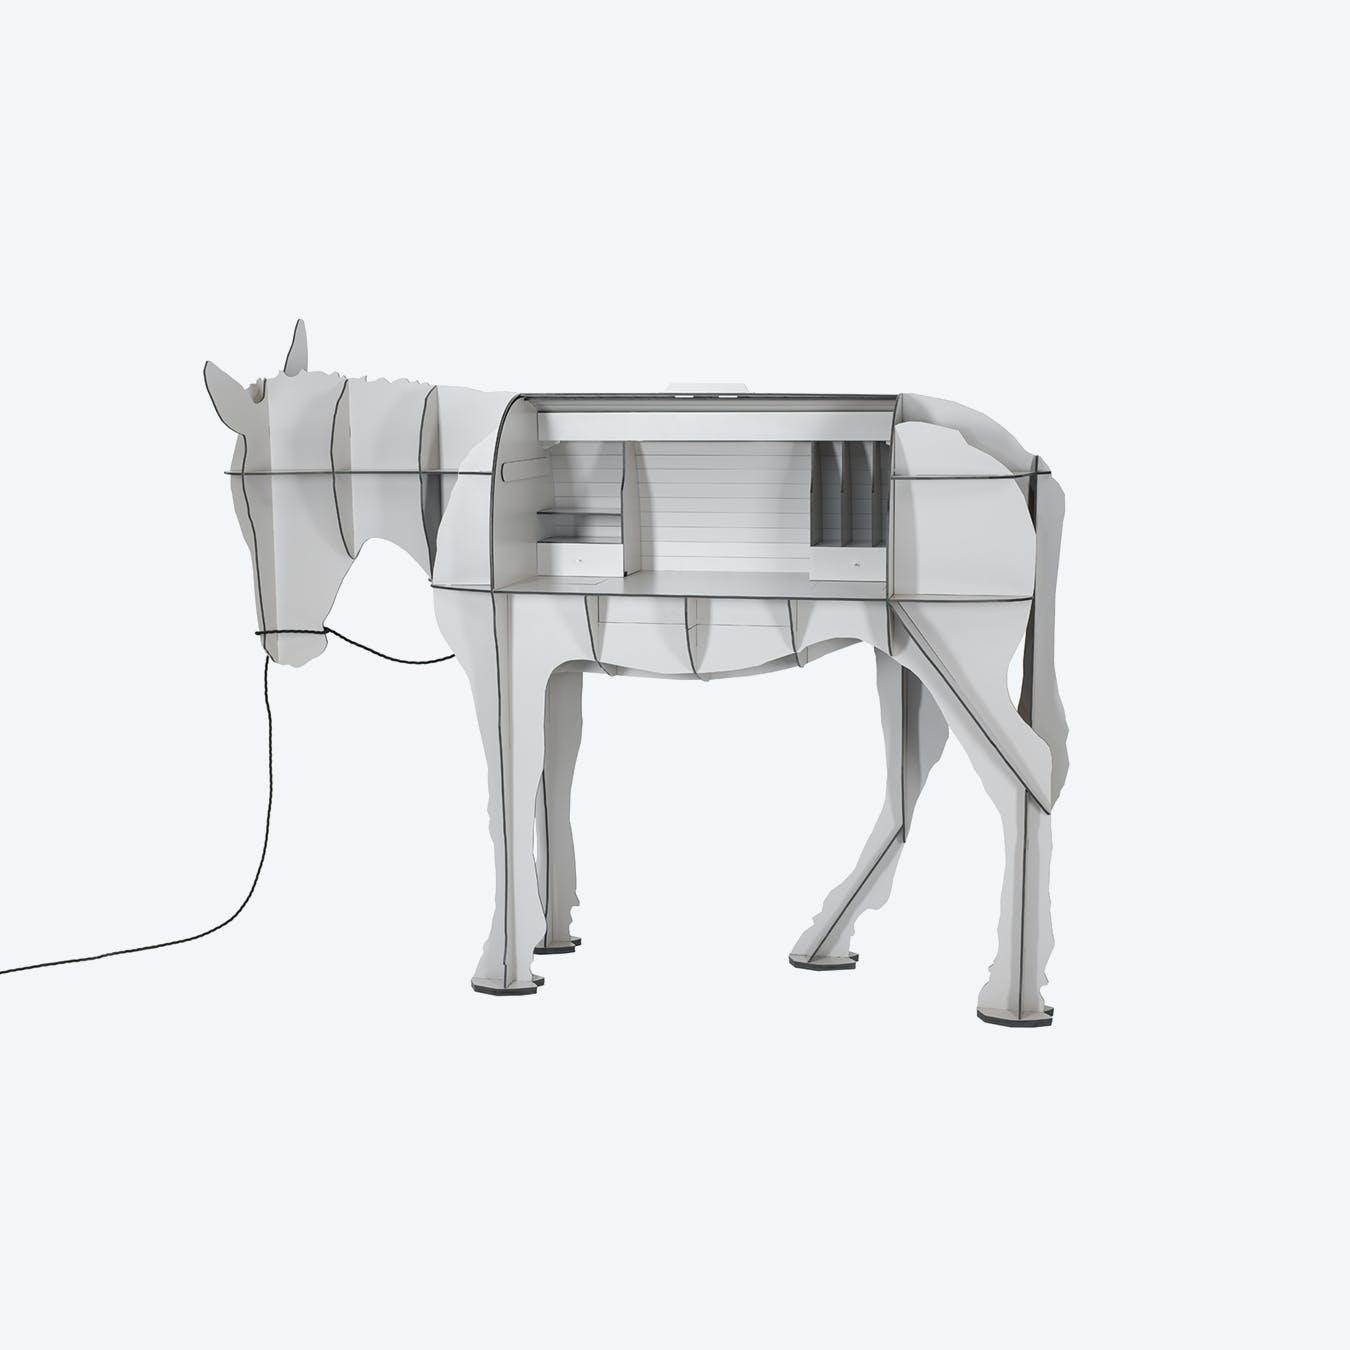 MATURIN Donkey Desk - Light Grey